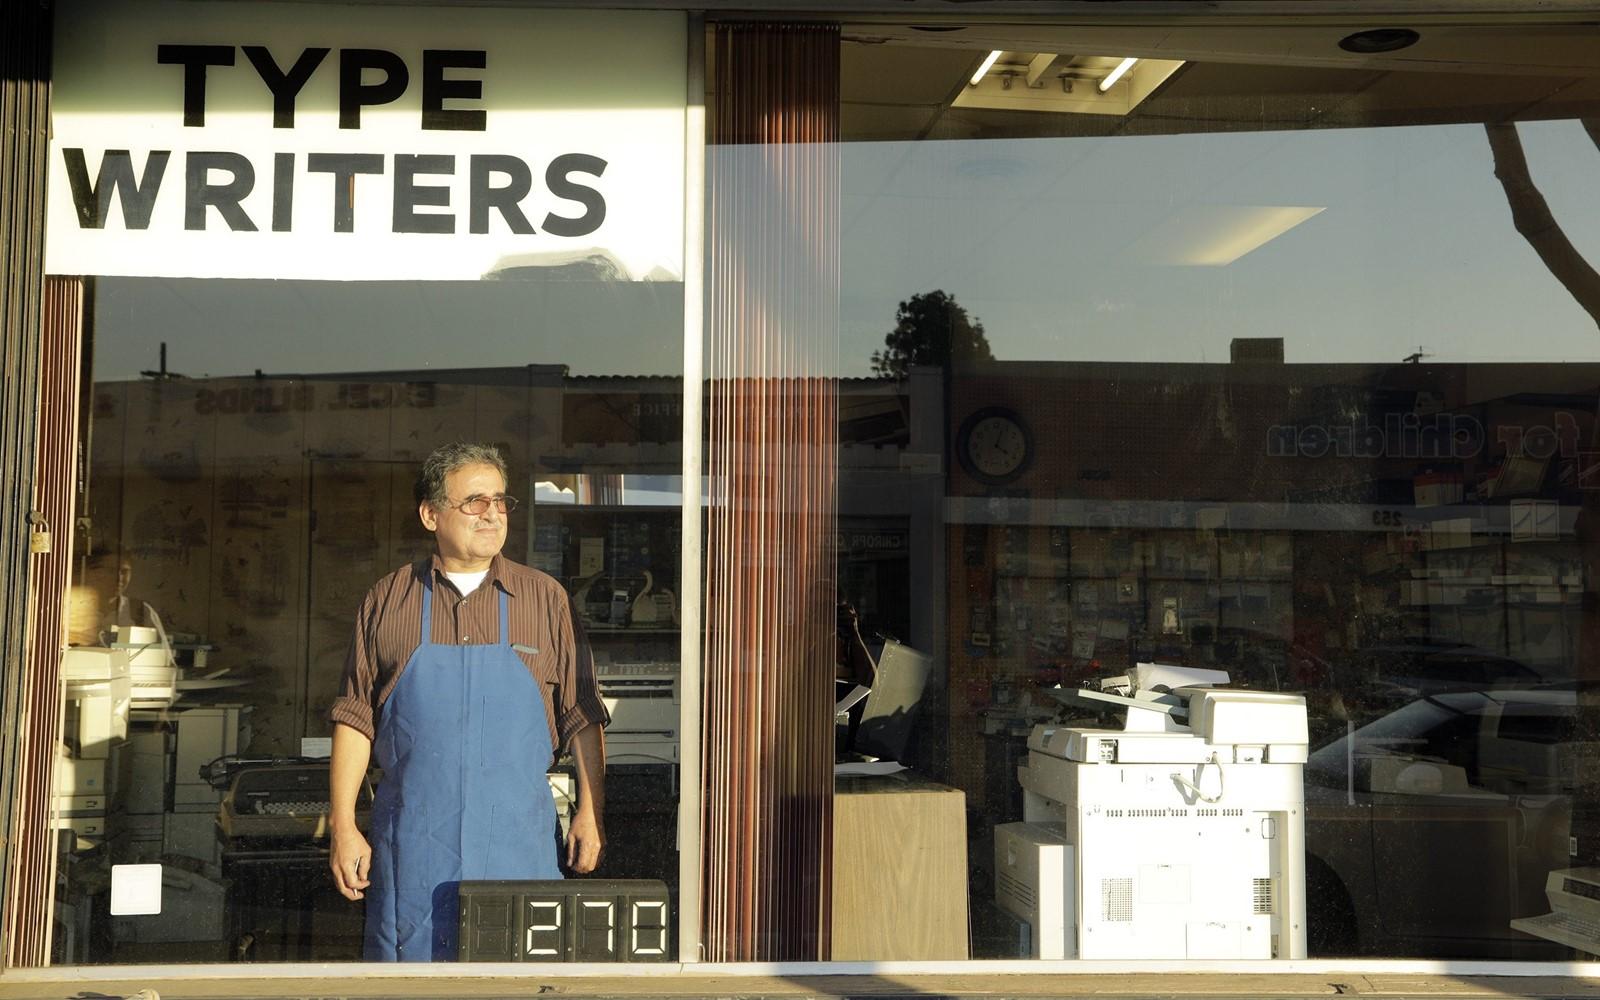 Print Repairman keeps trusty typewriters clicking A RENEWED interest